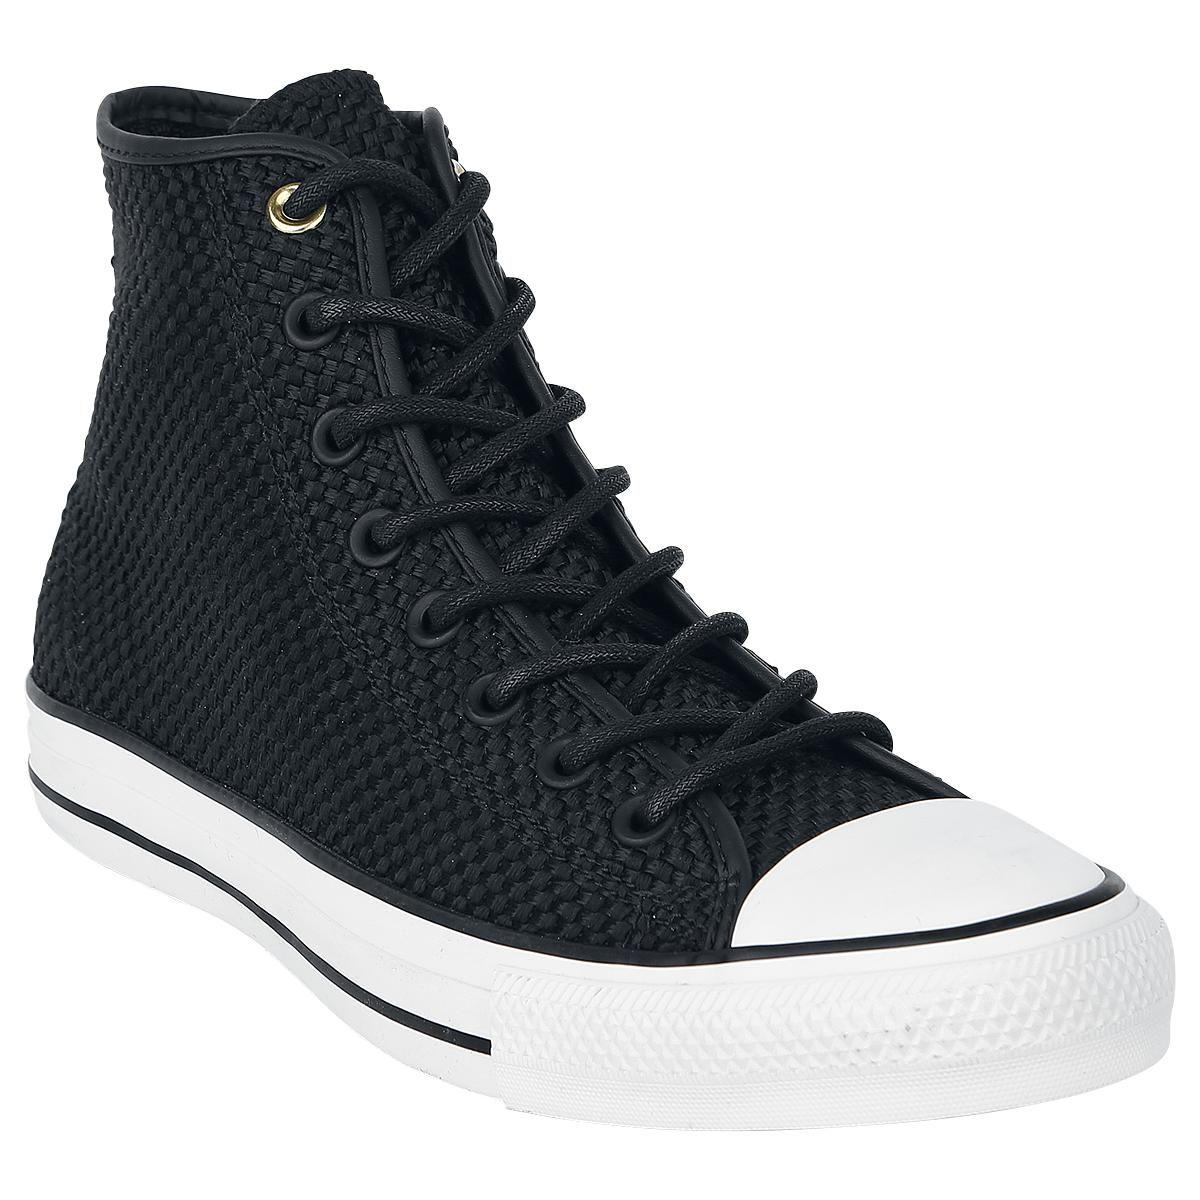 converse Scarpe Sportive Amp Ct Love Shoess Del Cloth As Brand aBU7aq